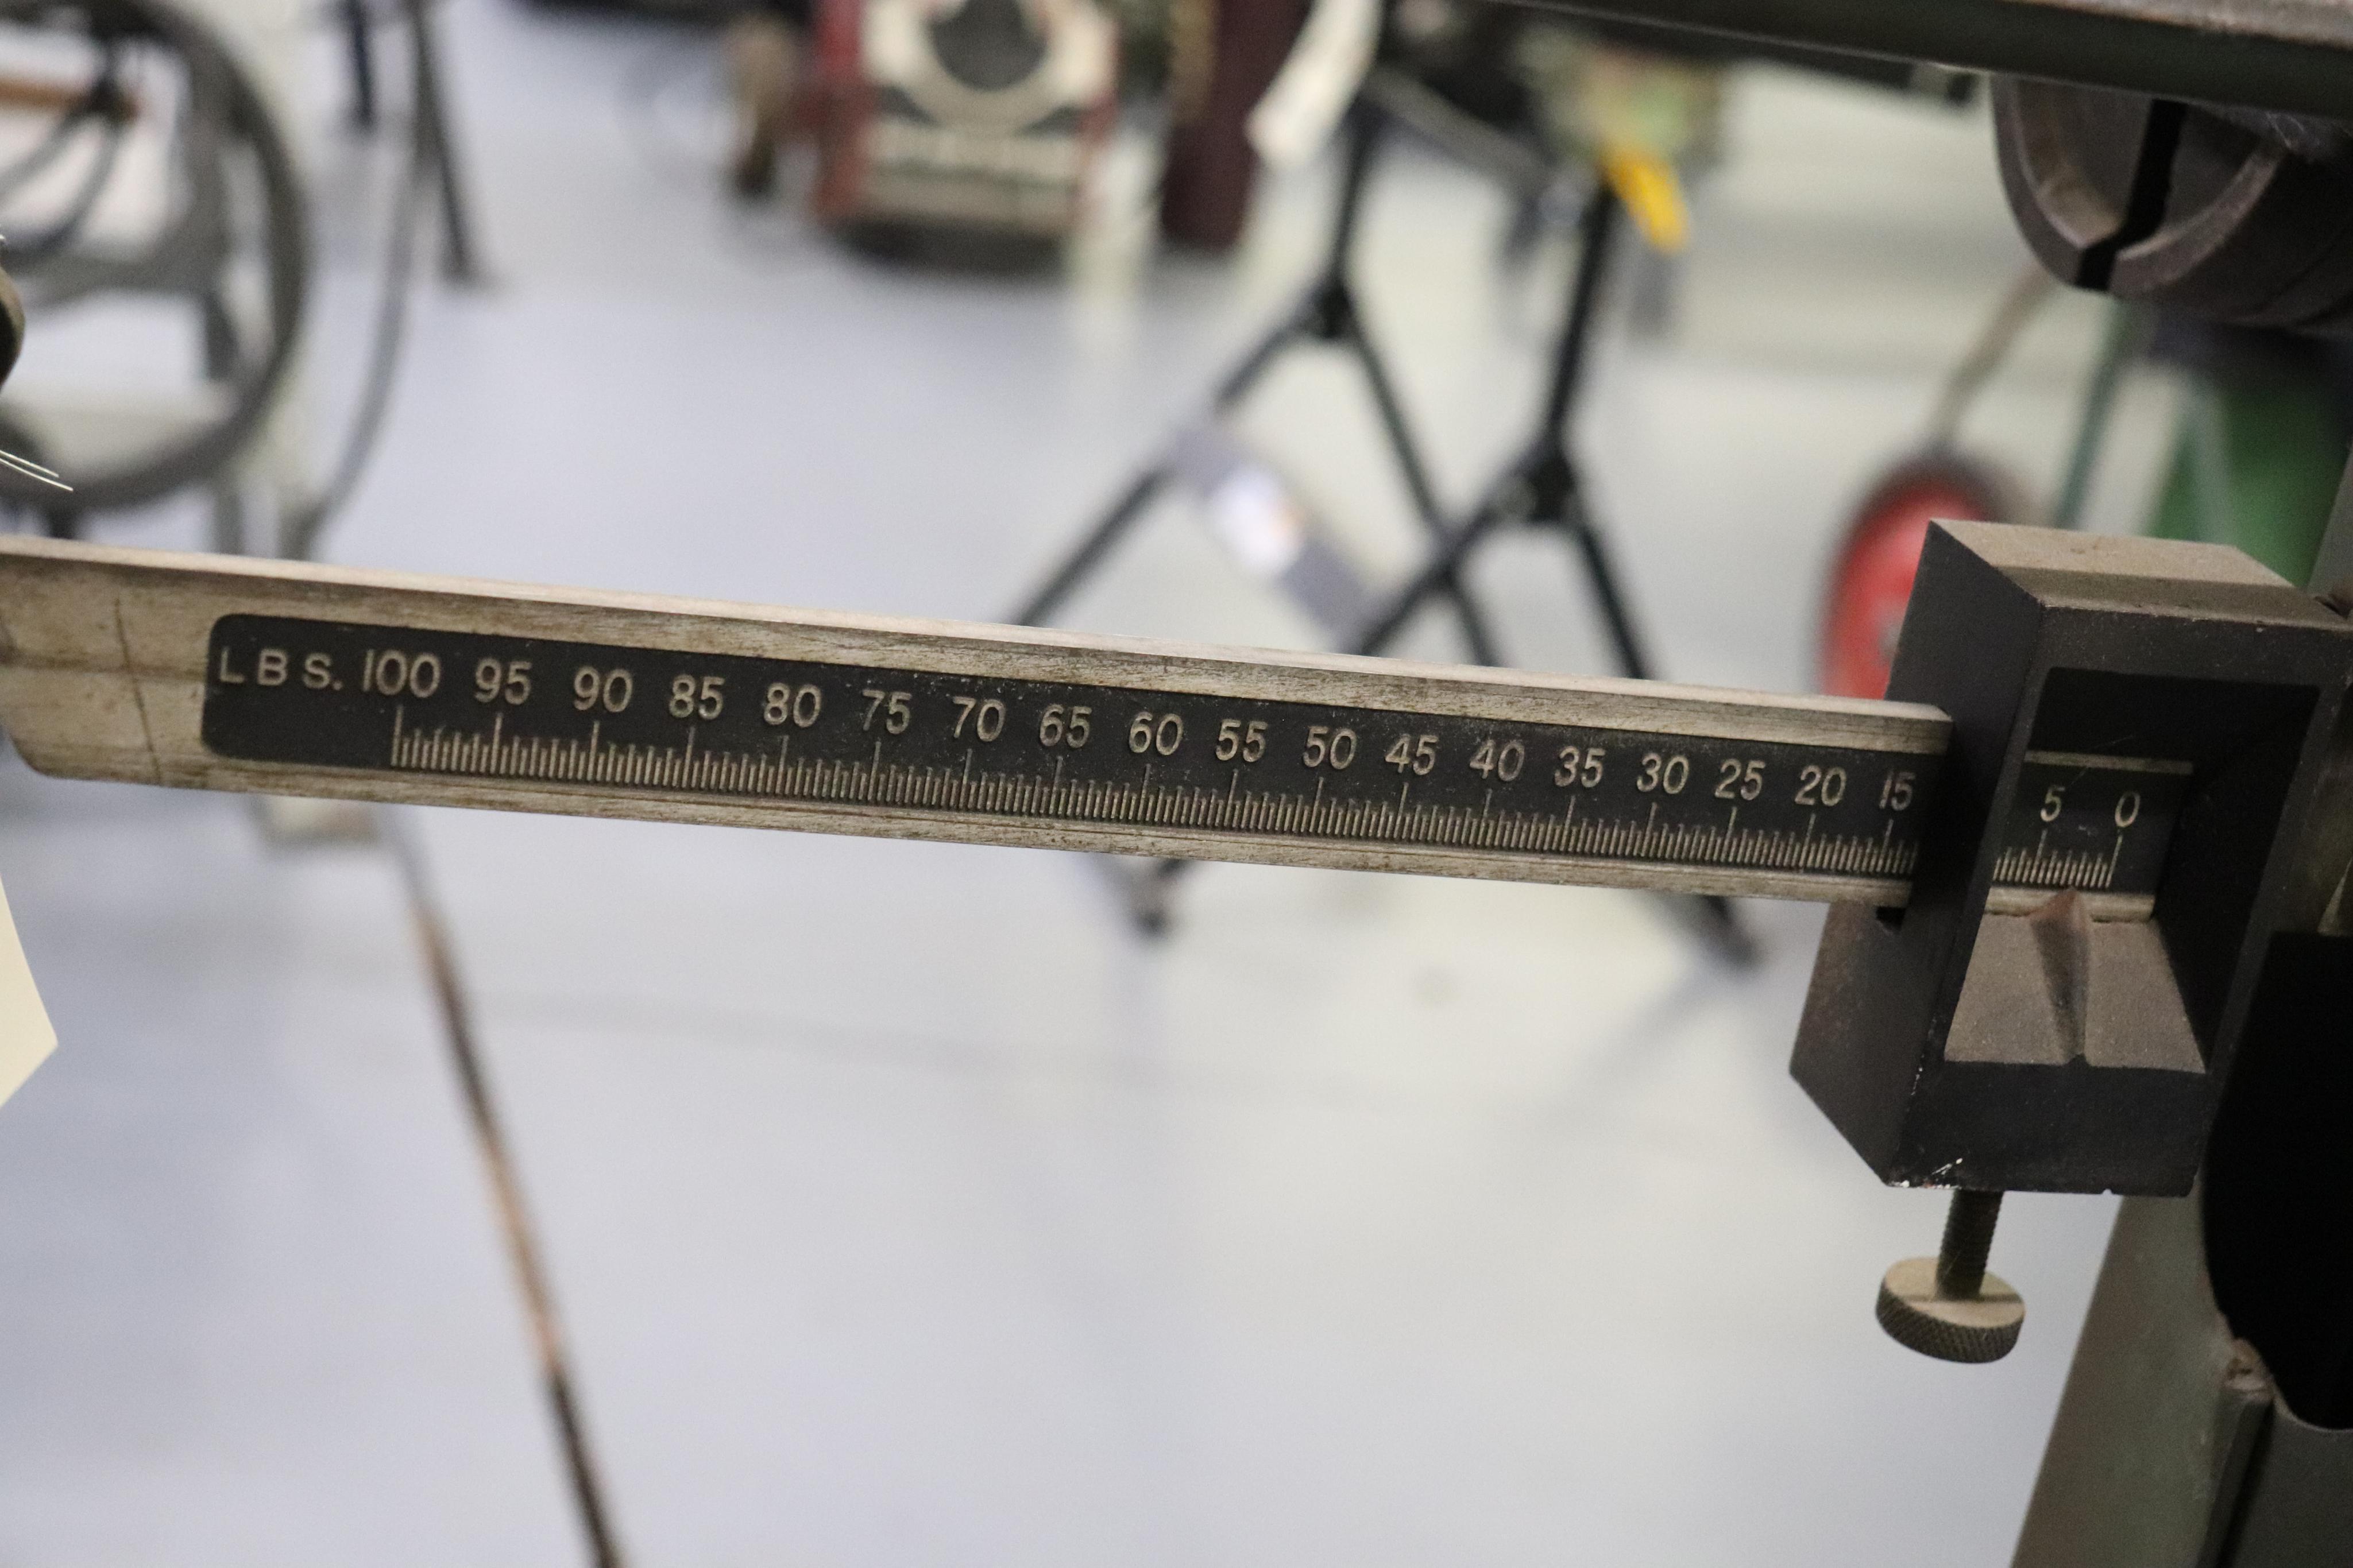 Fairbanks 1000 lbs. scale - Image 2 of 4